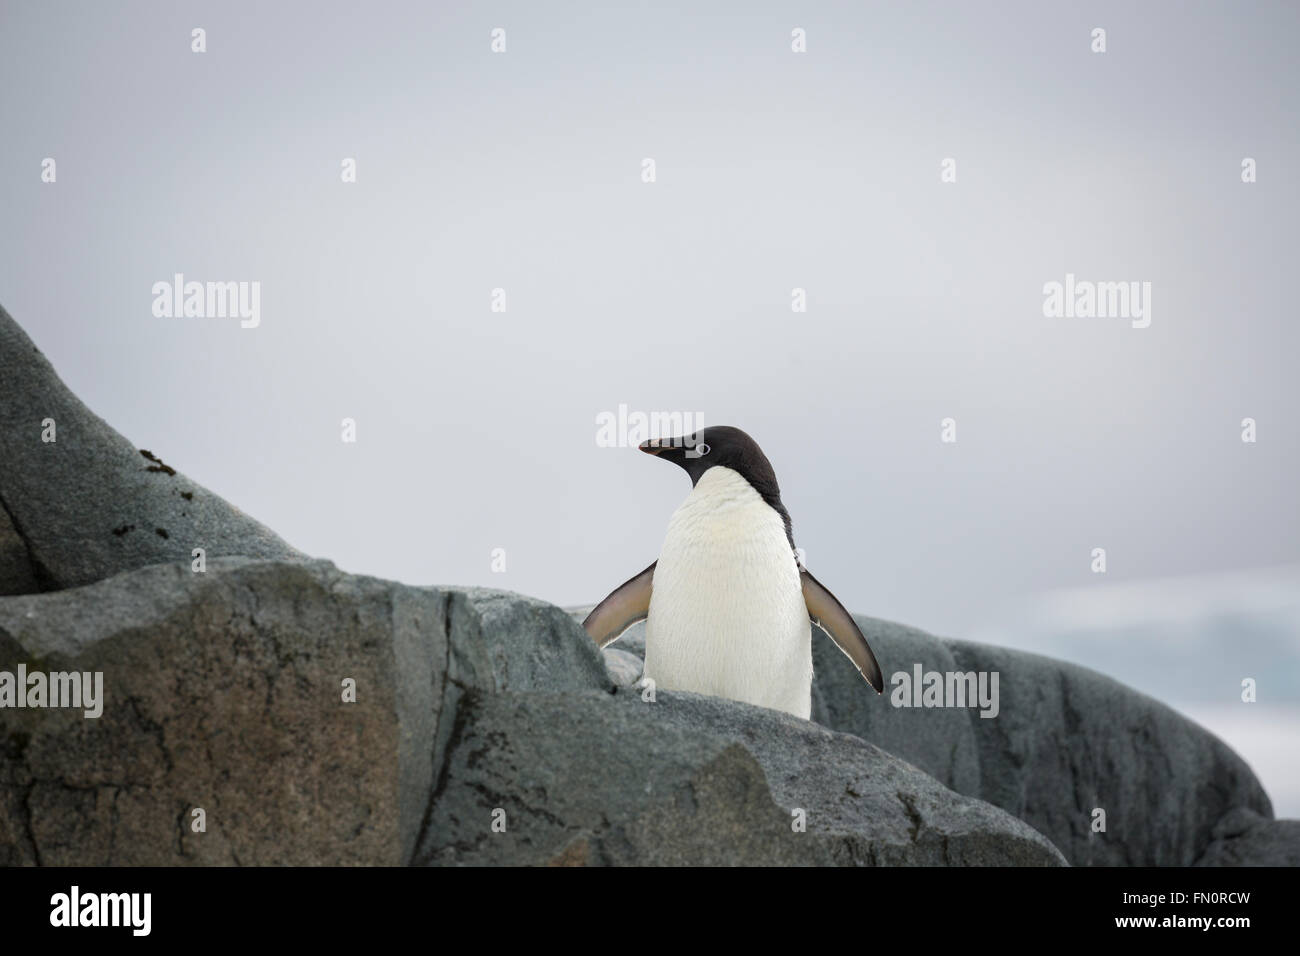 Antarktis, antarktische Halbinsel, Petermann Island Adelie Pinguin. Stockbild